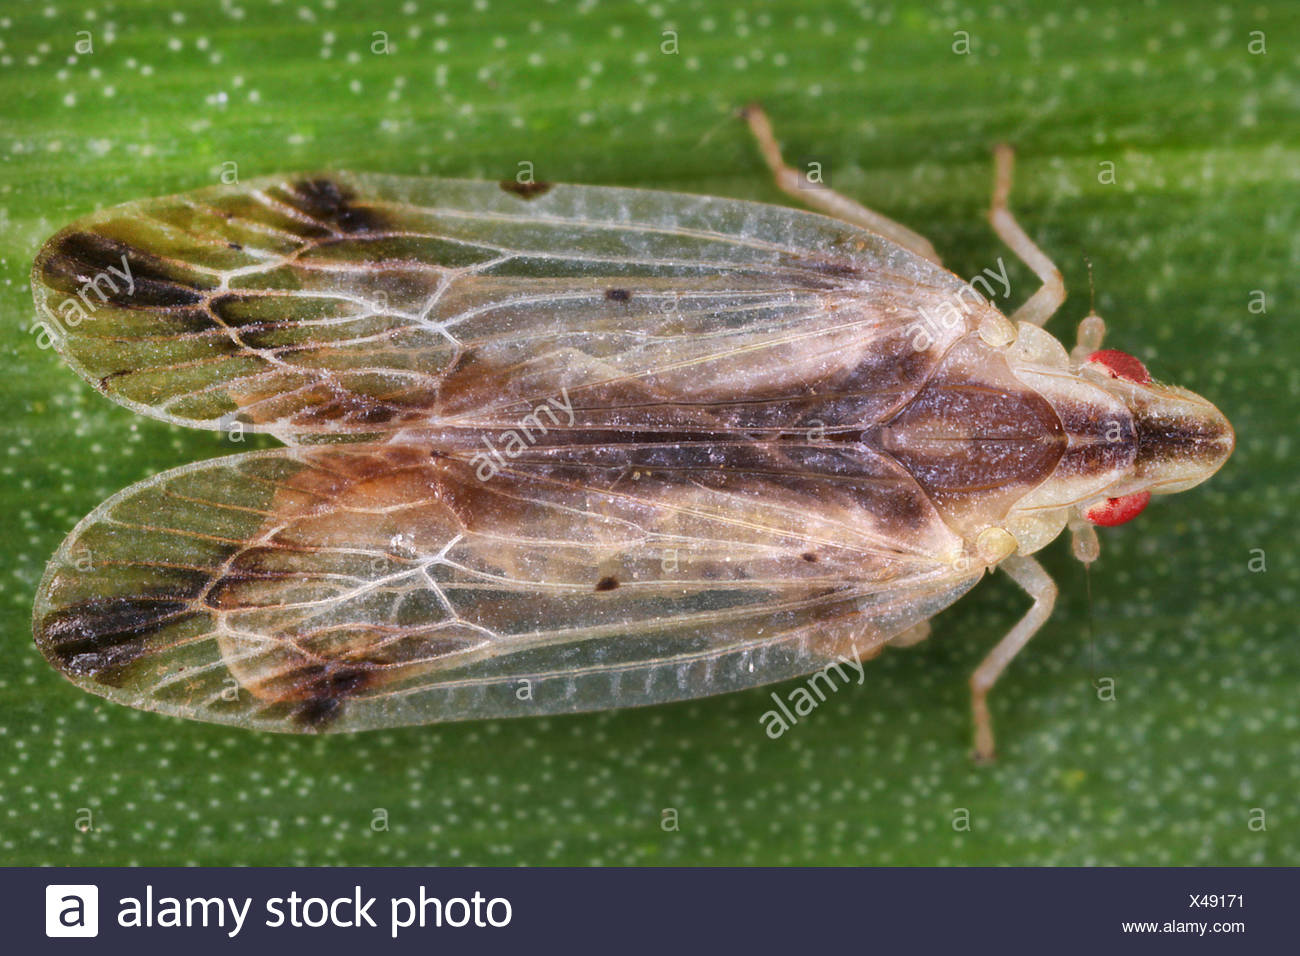 Mueckenzikade, Muecken-Zikade (Tropiduchidae), sitzt auf einem Blatt, Costa Rica | Tropiduchid planthopper (Tropiduchidae), sits - Stock Image